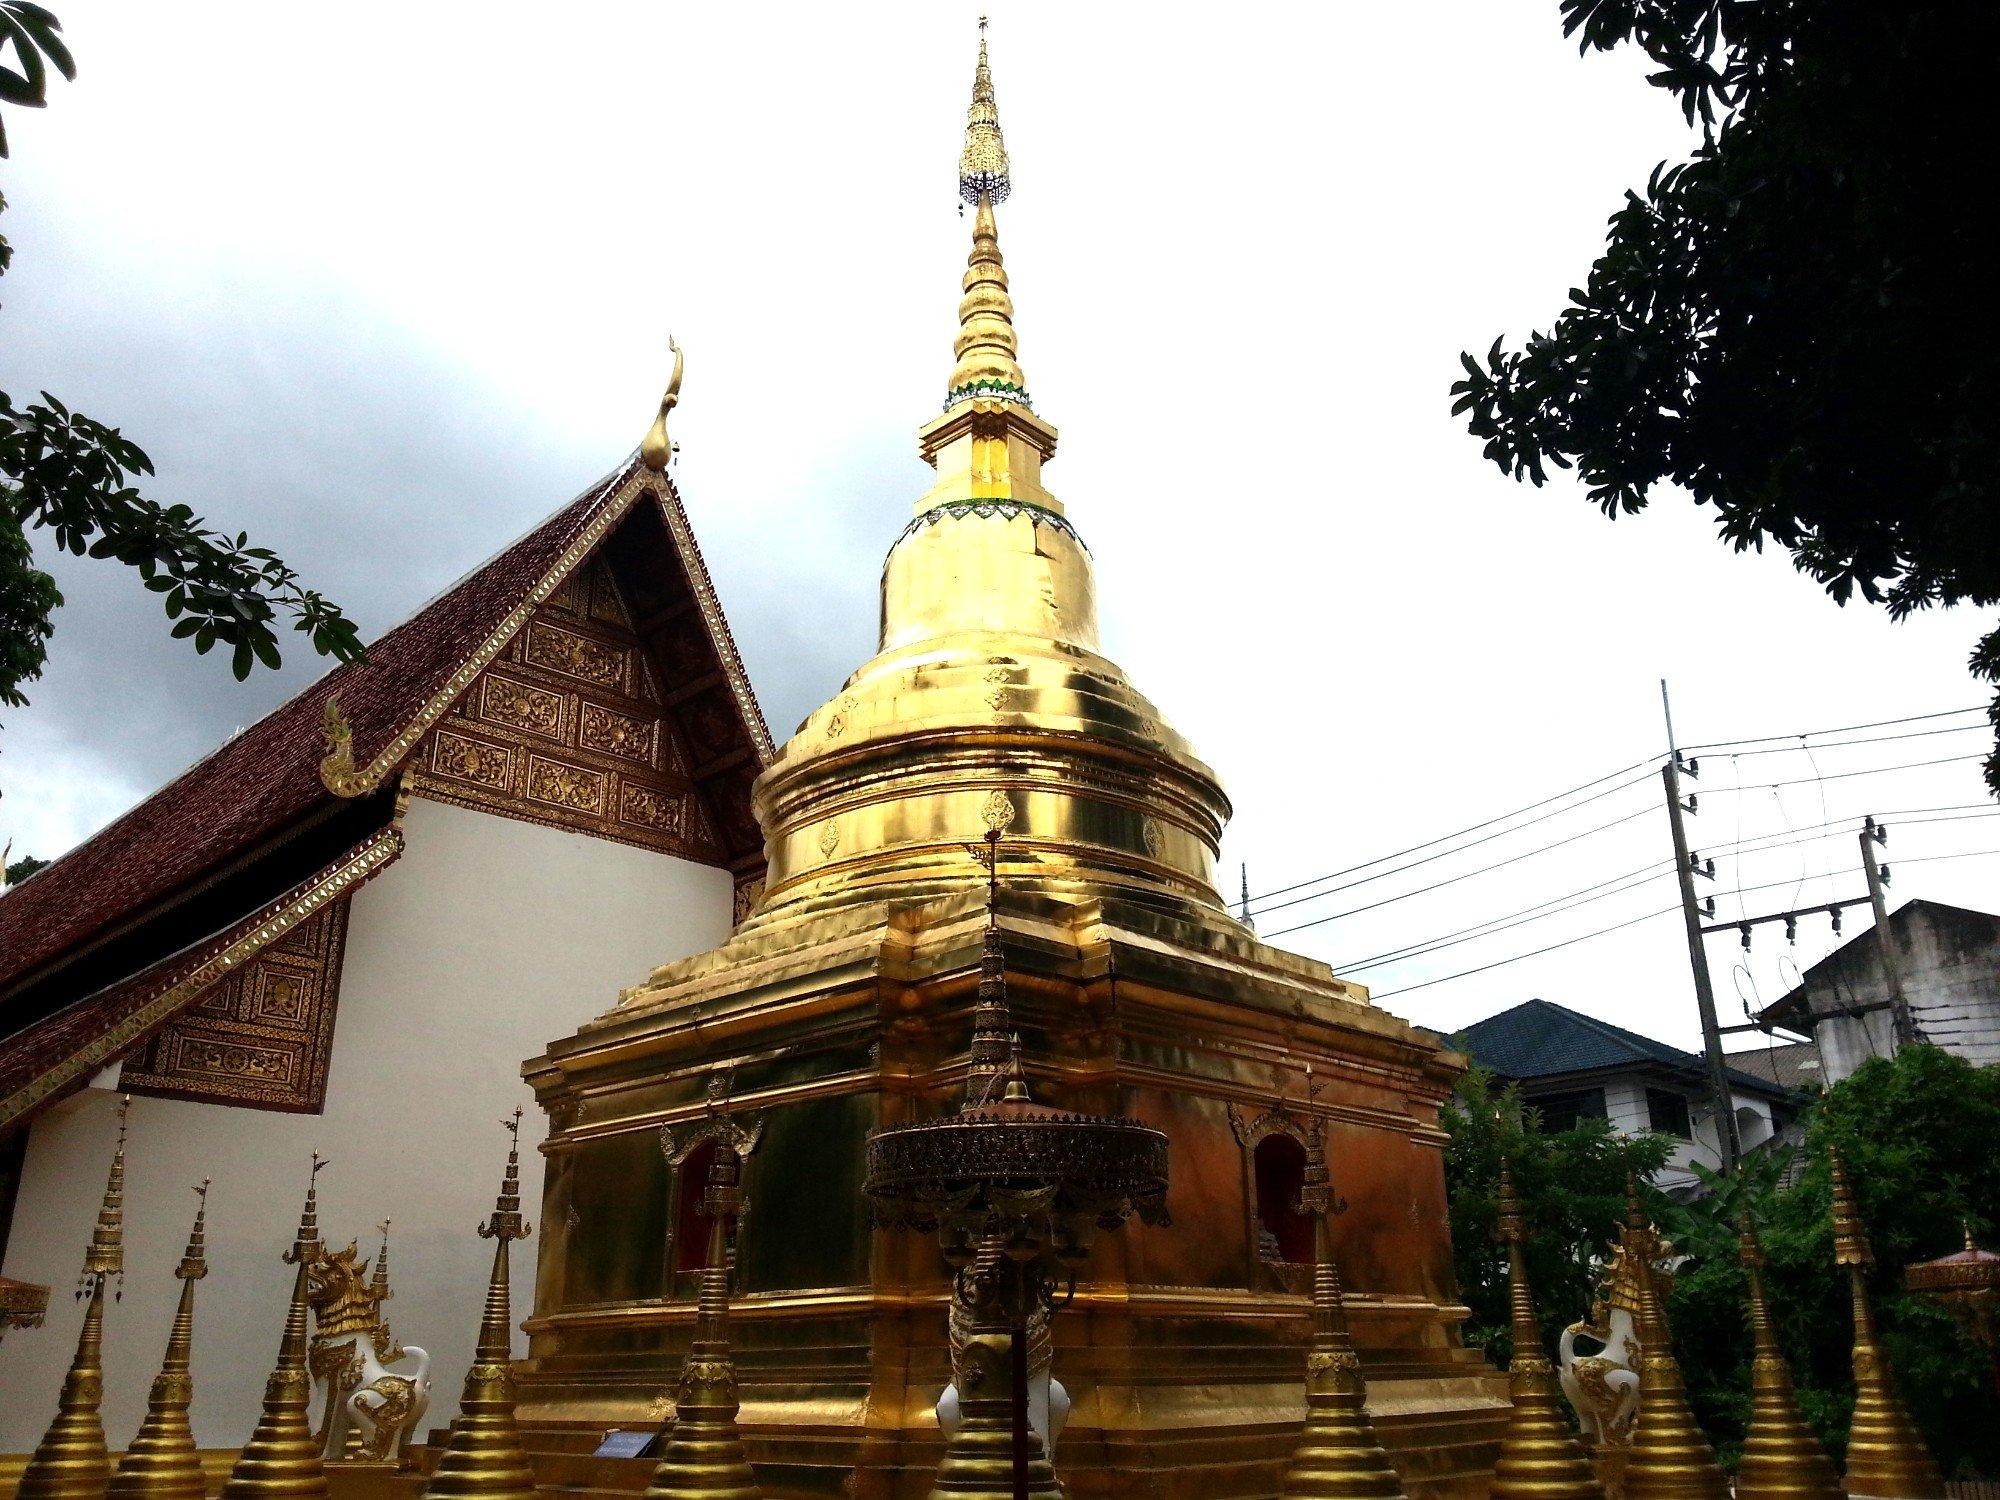 Chedi at Wat Phra Sing